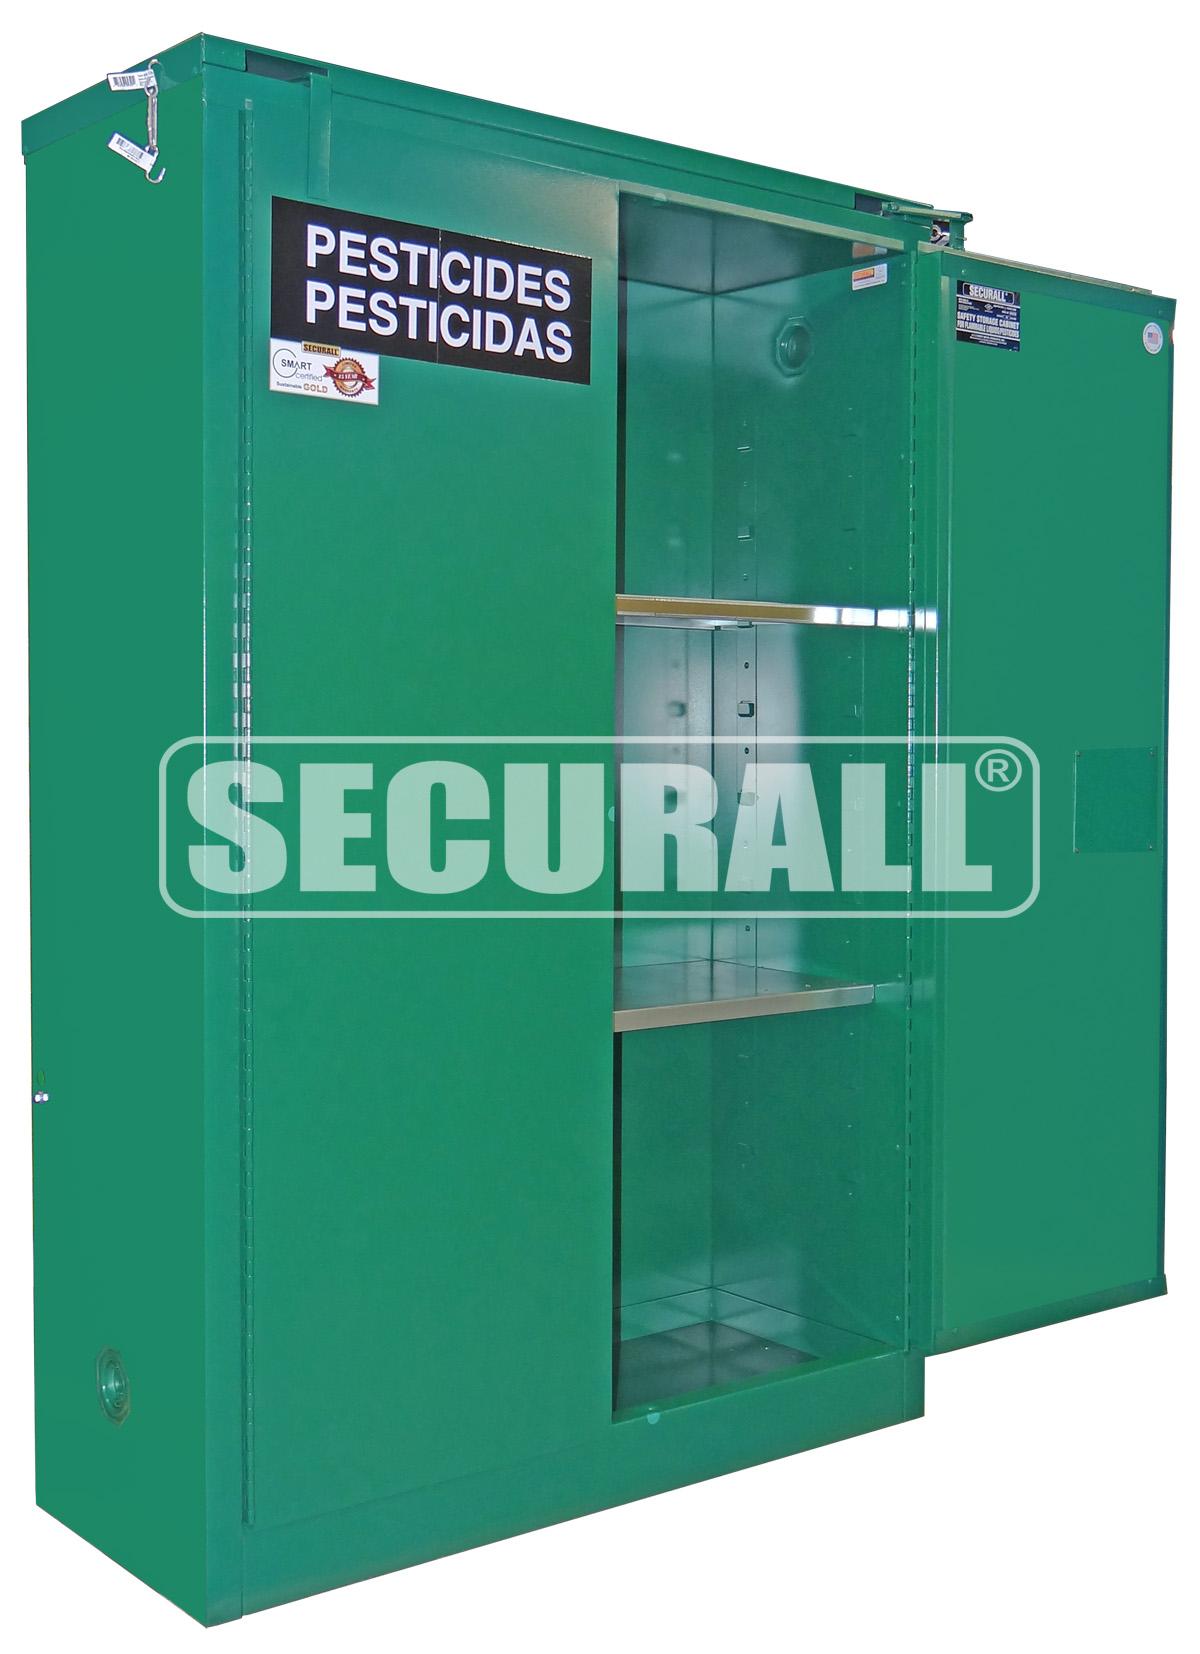 SECURALL® Chemical Storage Cabinets - Pesticide u0026 Chemical Storage Cabinets Chemical Cabinet Agrichemical Storage Cabinets Turf Management Chemical ...  sc 1 st  SECURALL & SECURALL® Chemical Storage Cabinets - Pesticide u0026 Chemical Storage ...